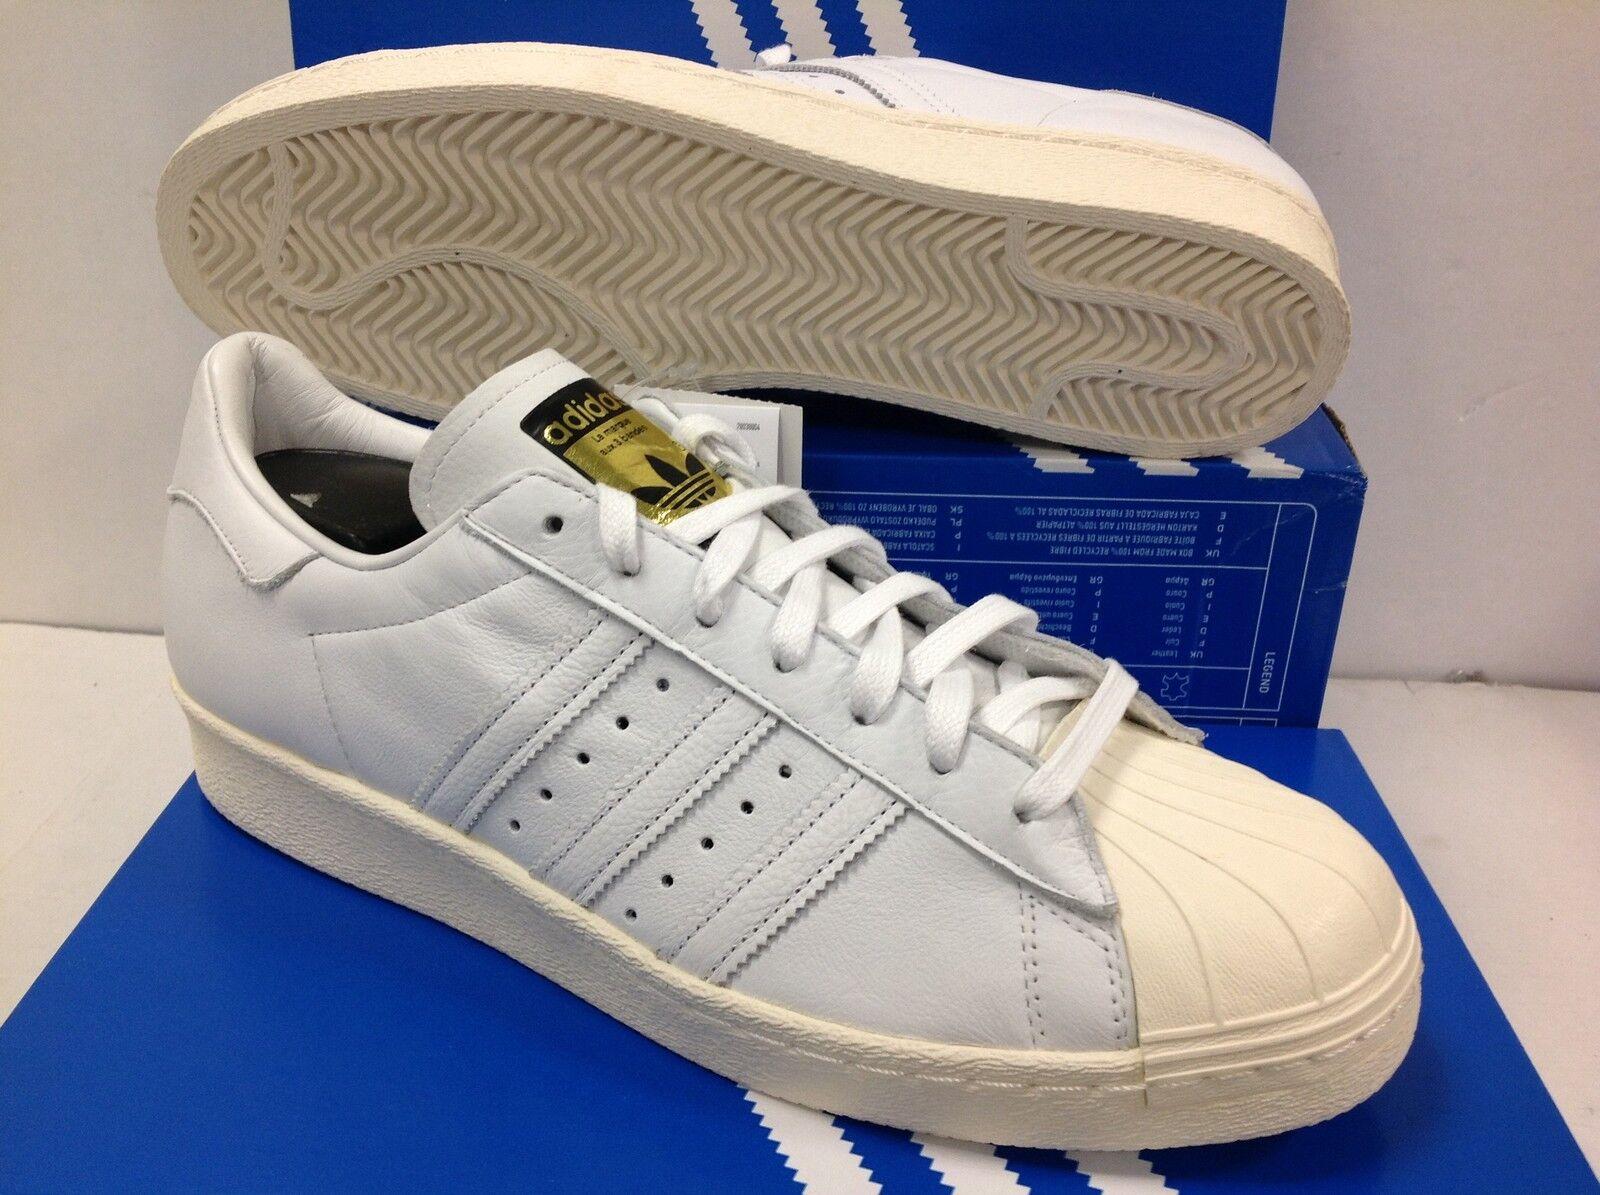 ADIDAS S7501-6 Originals Superstar 80s DLX S7501-6 ADIDAS Para hombre Zapatillas, Talla / 9380e6